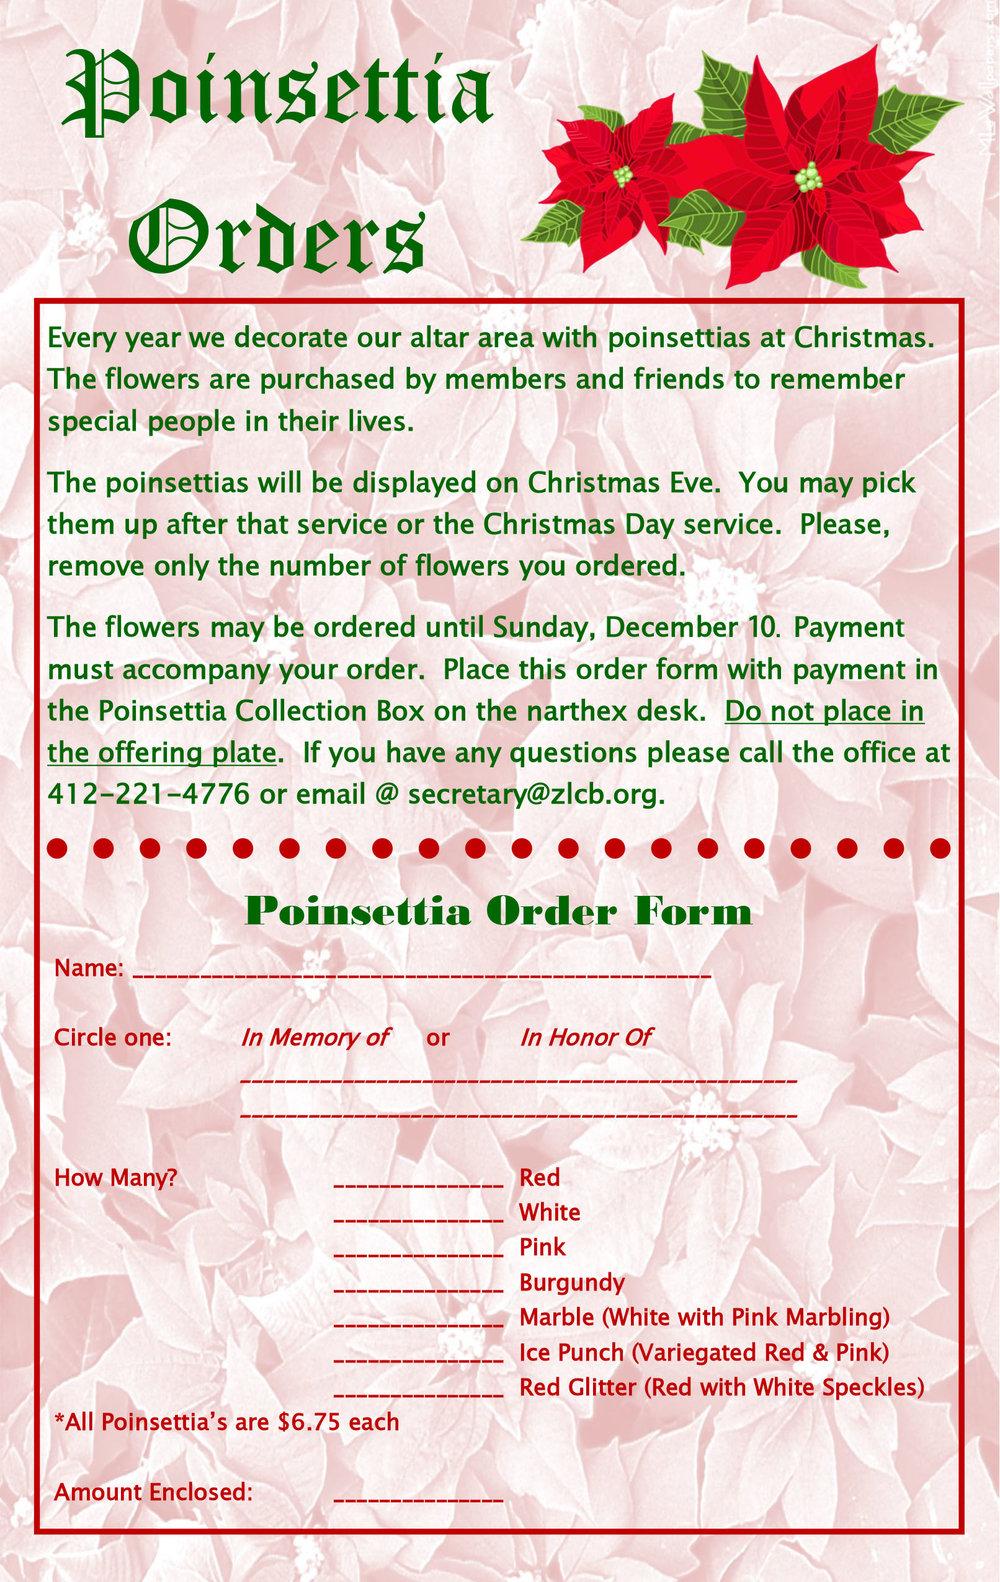 Poinsettia Order Form 2017.jpg